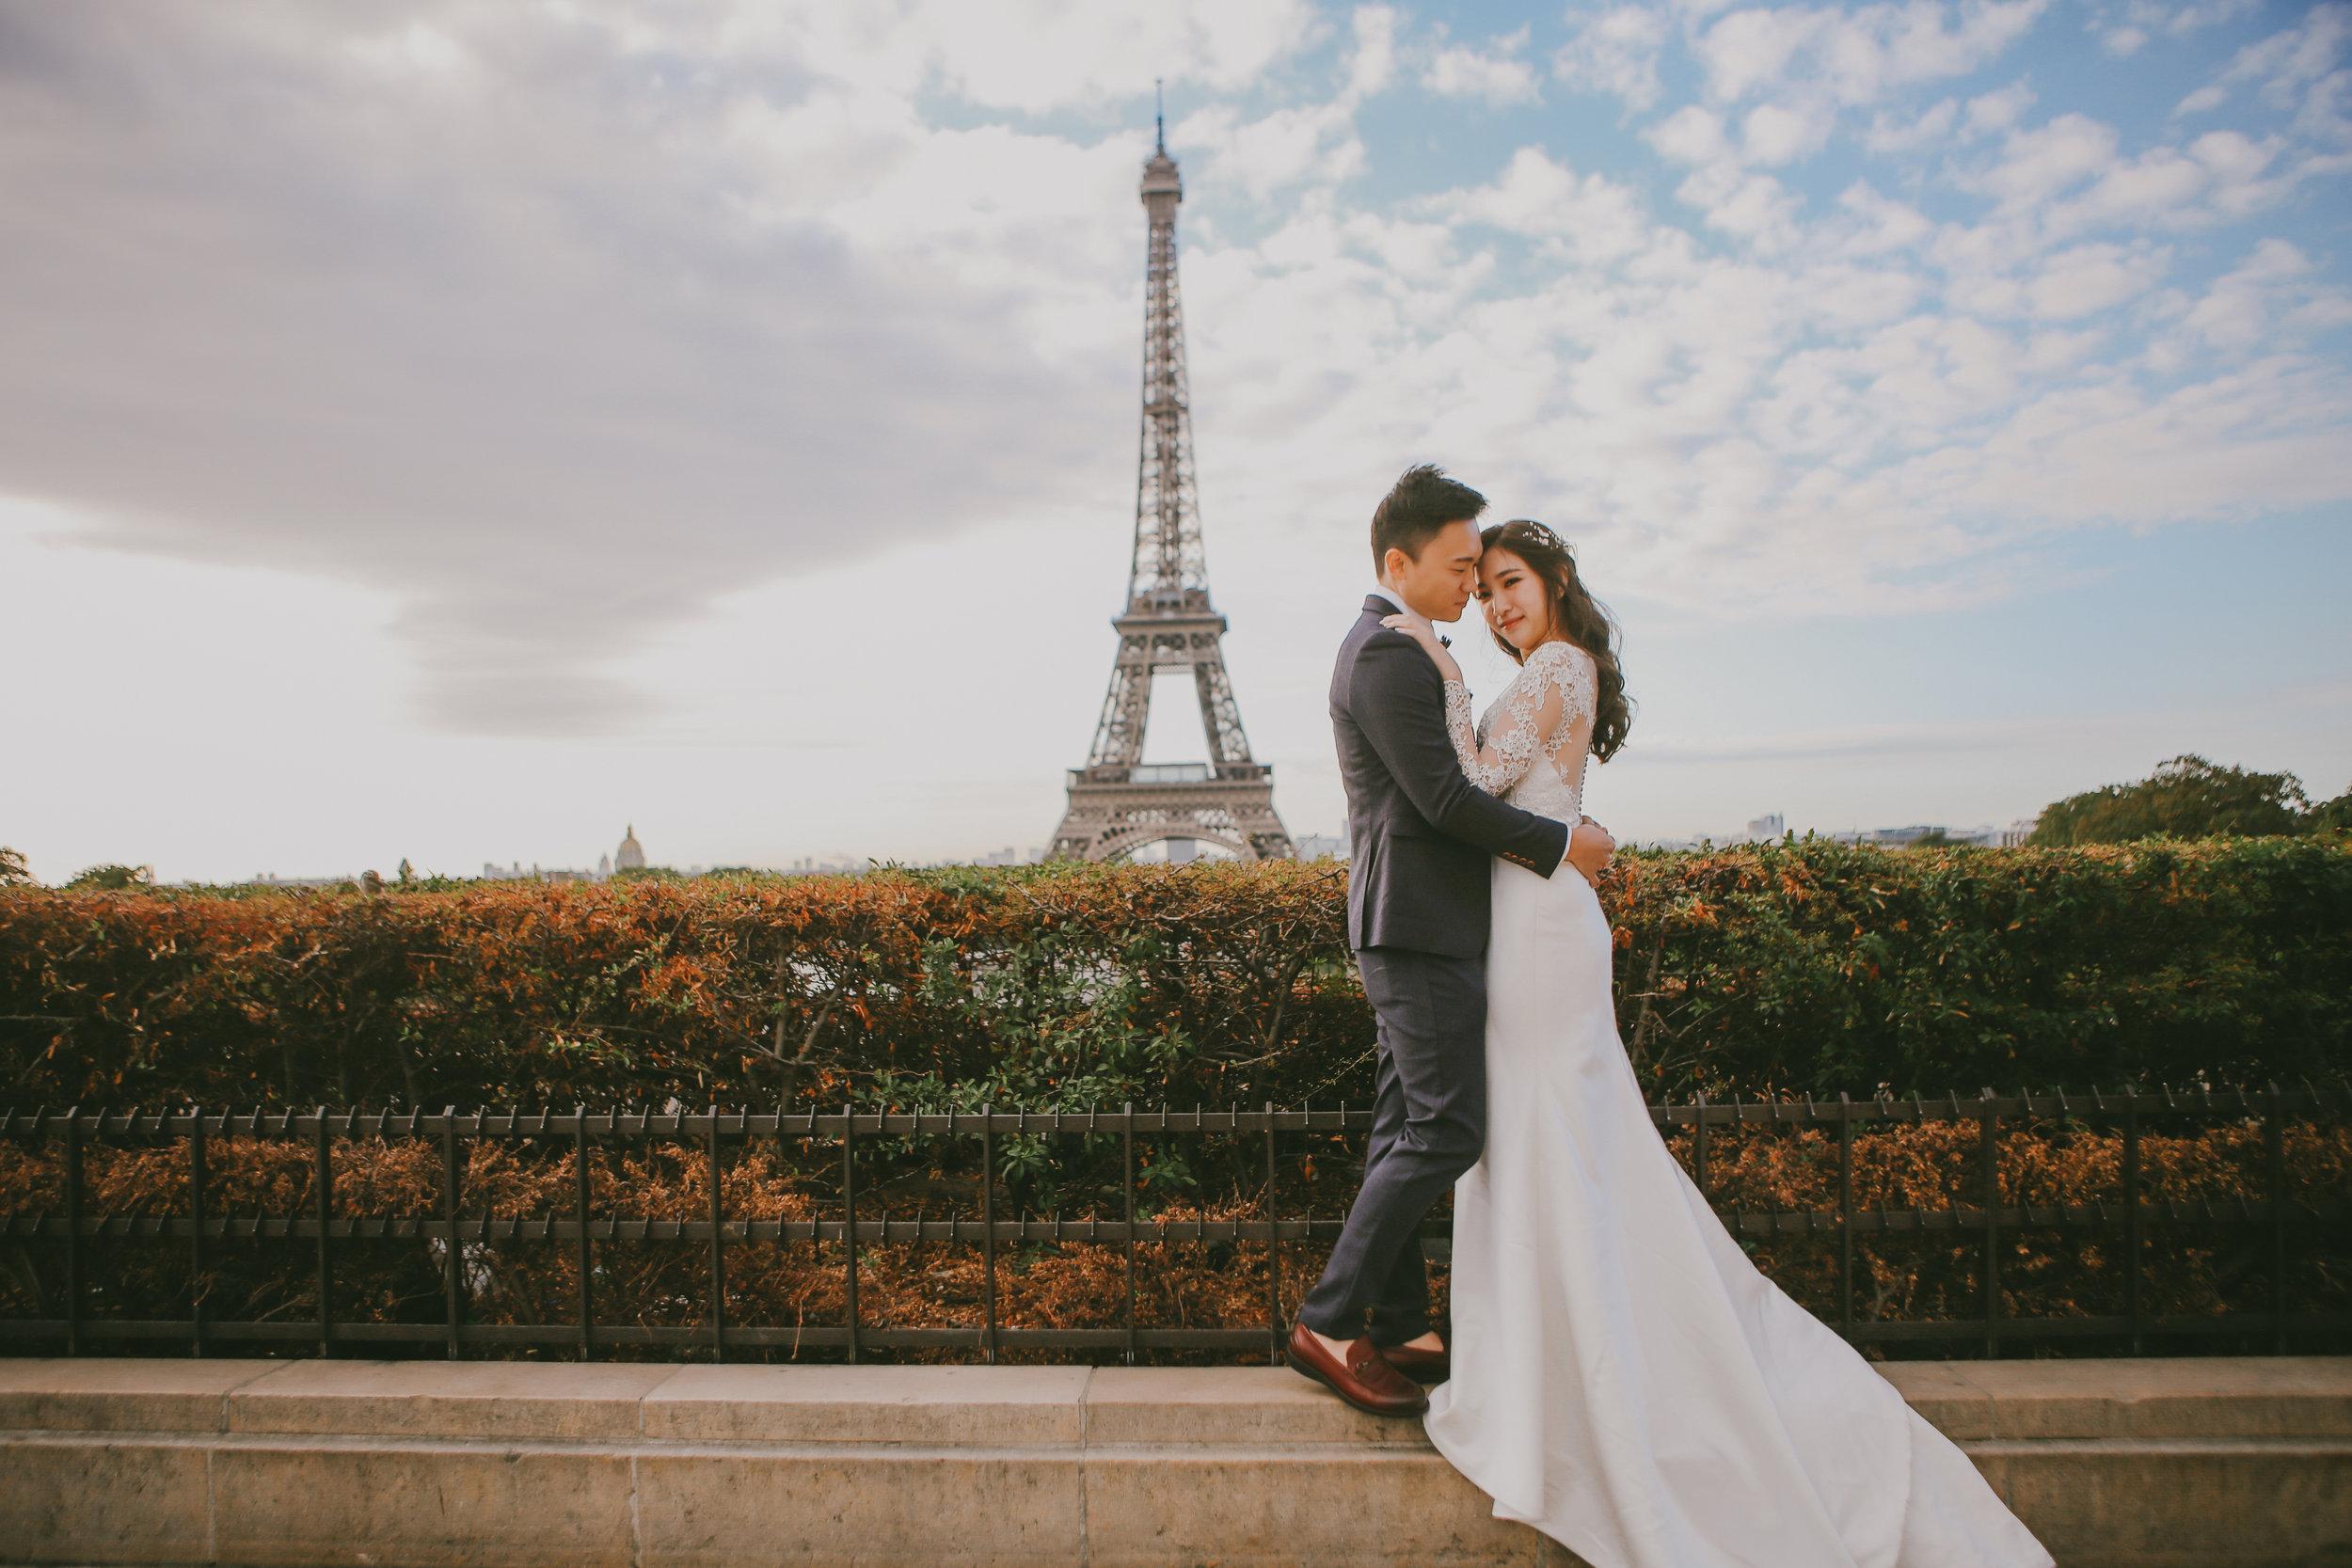 2018-pre-wedding-studio-numb9r-paris-high-0921e.jpg